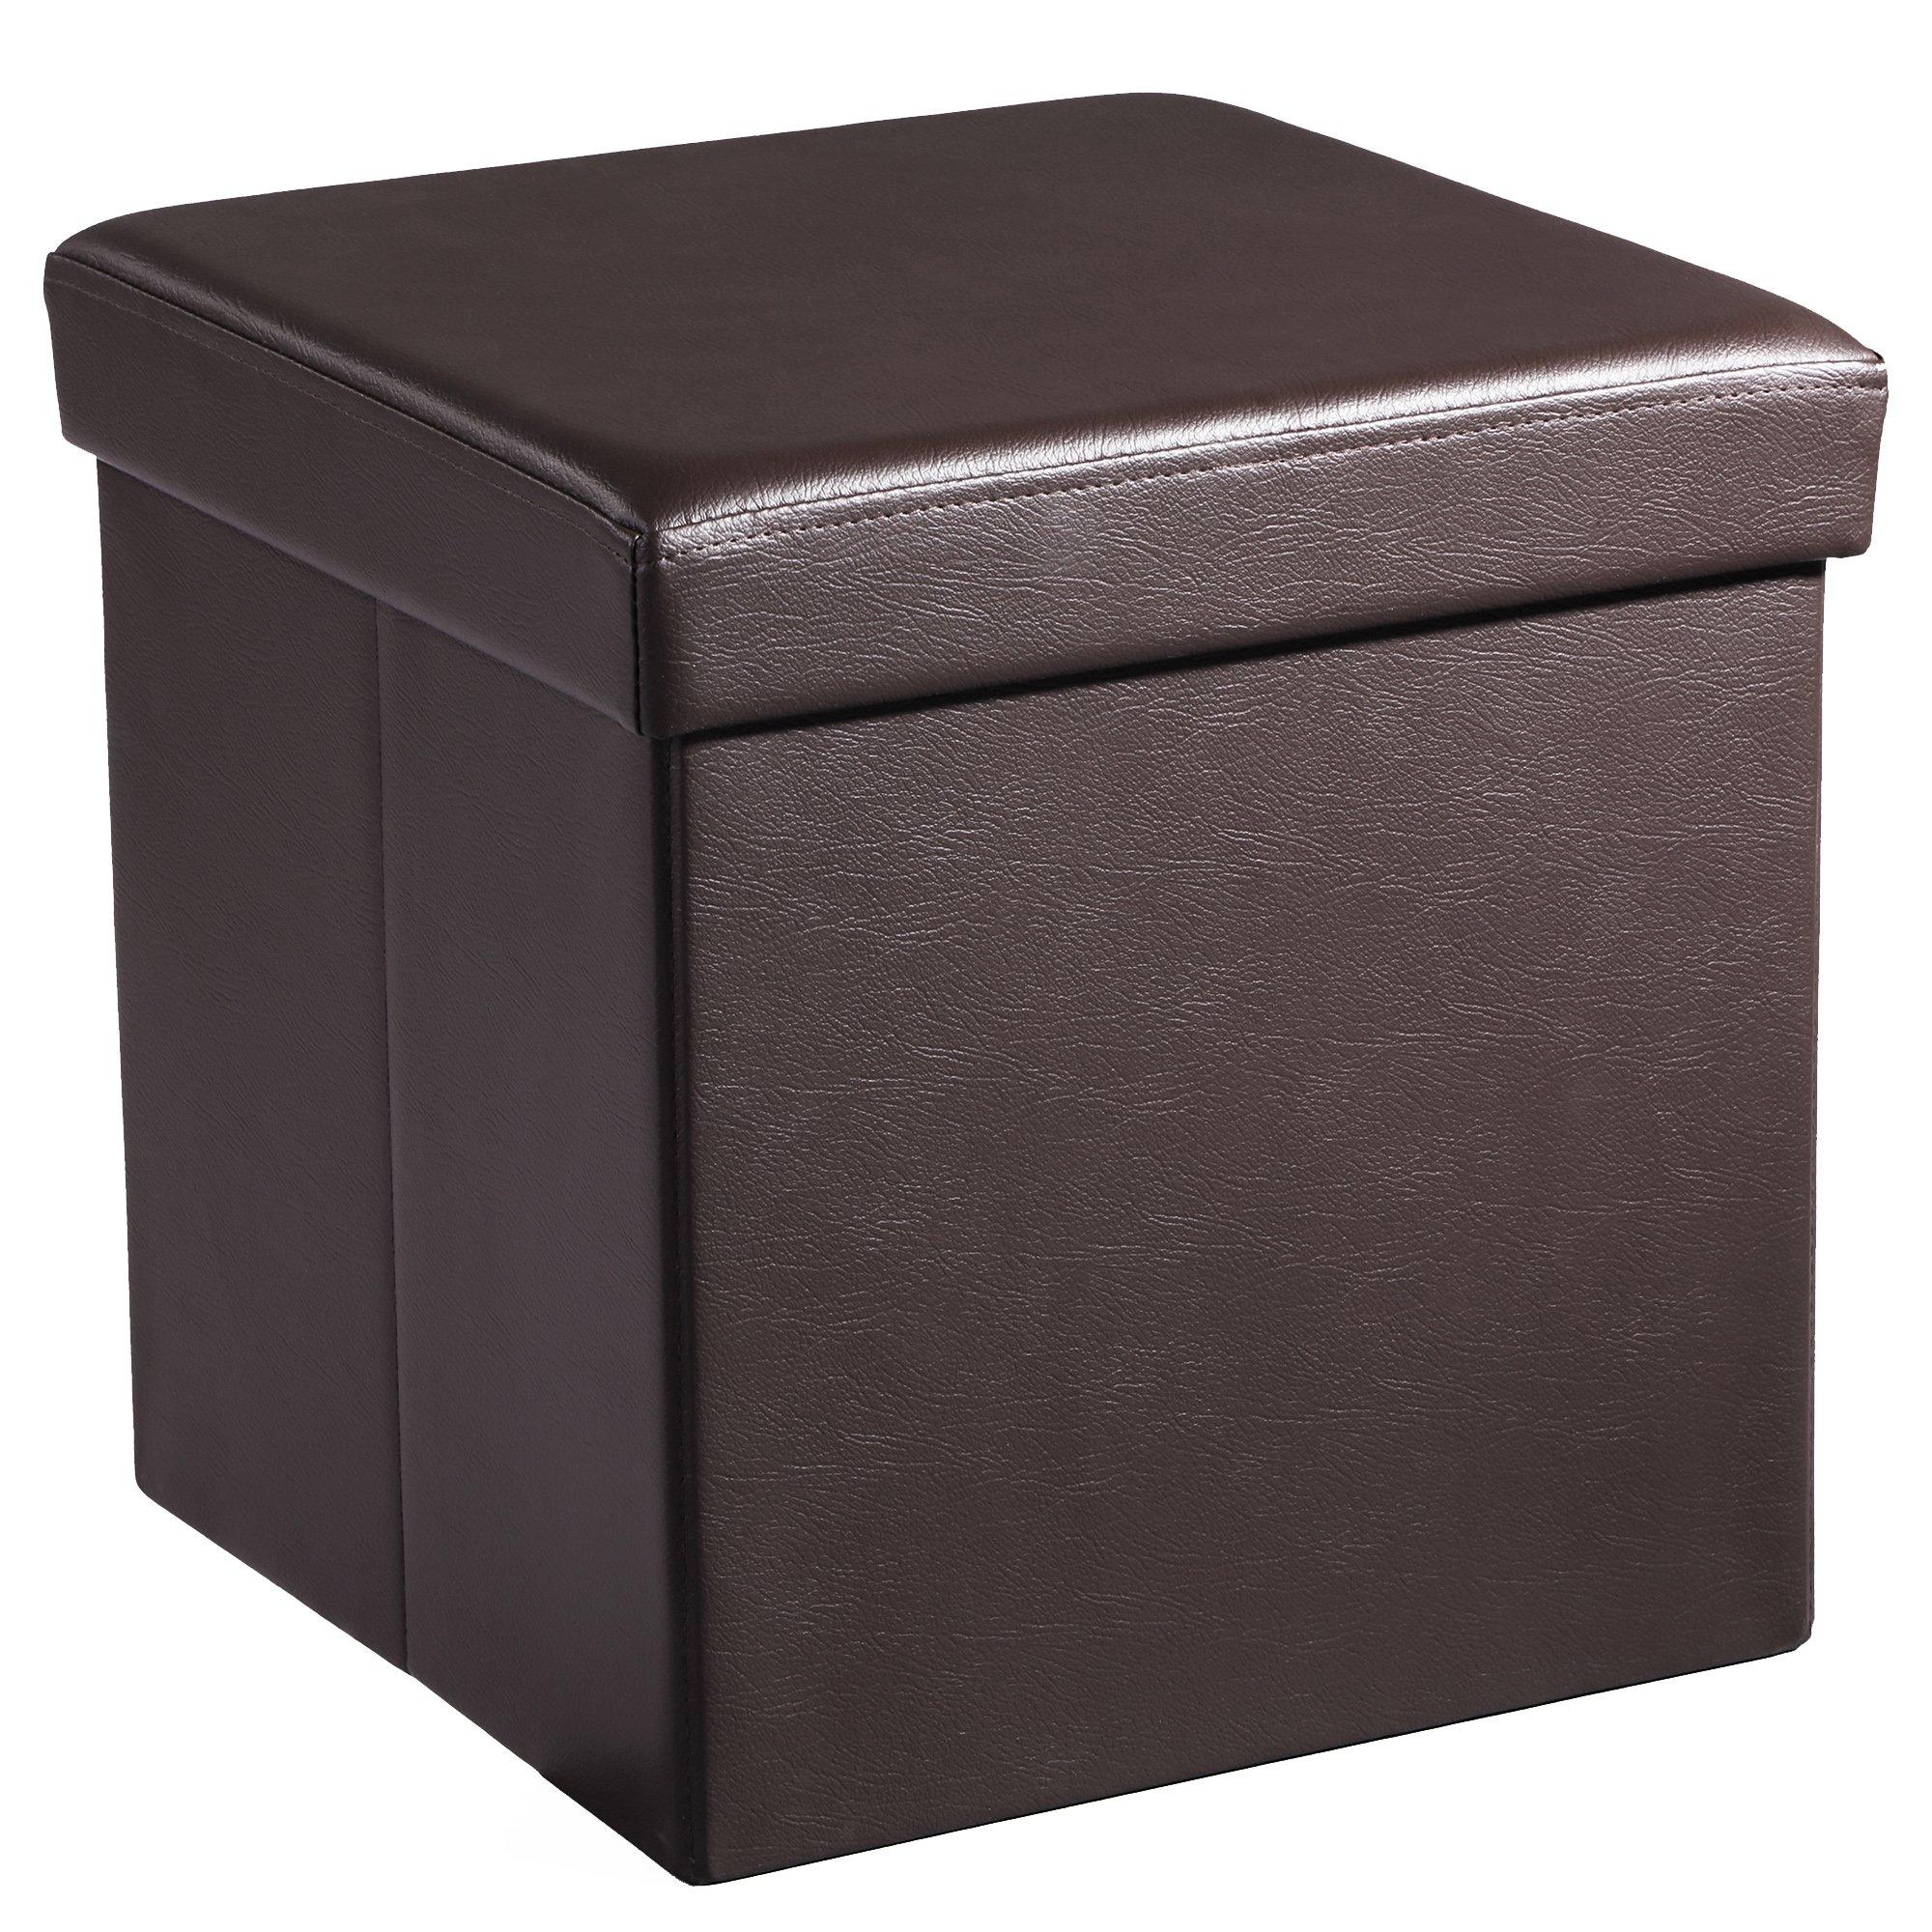 SONGMICS Storage Ottoman Footrest ULSF10B